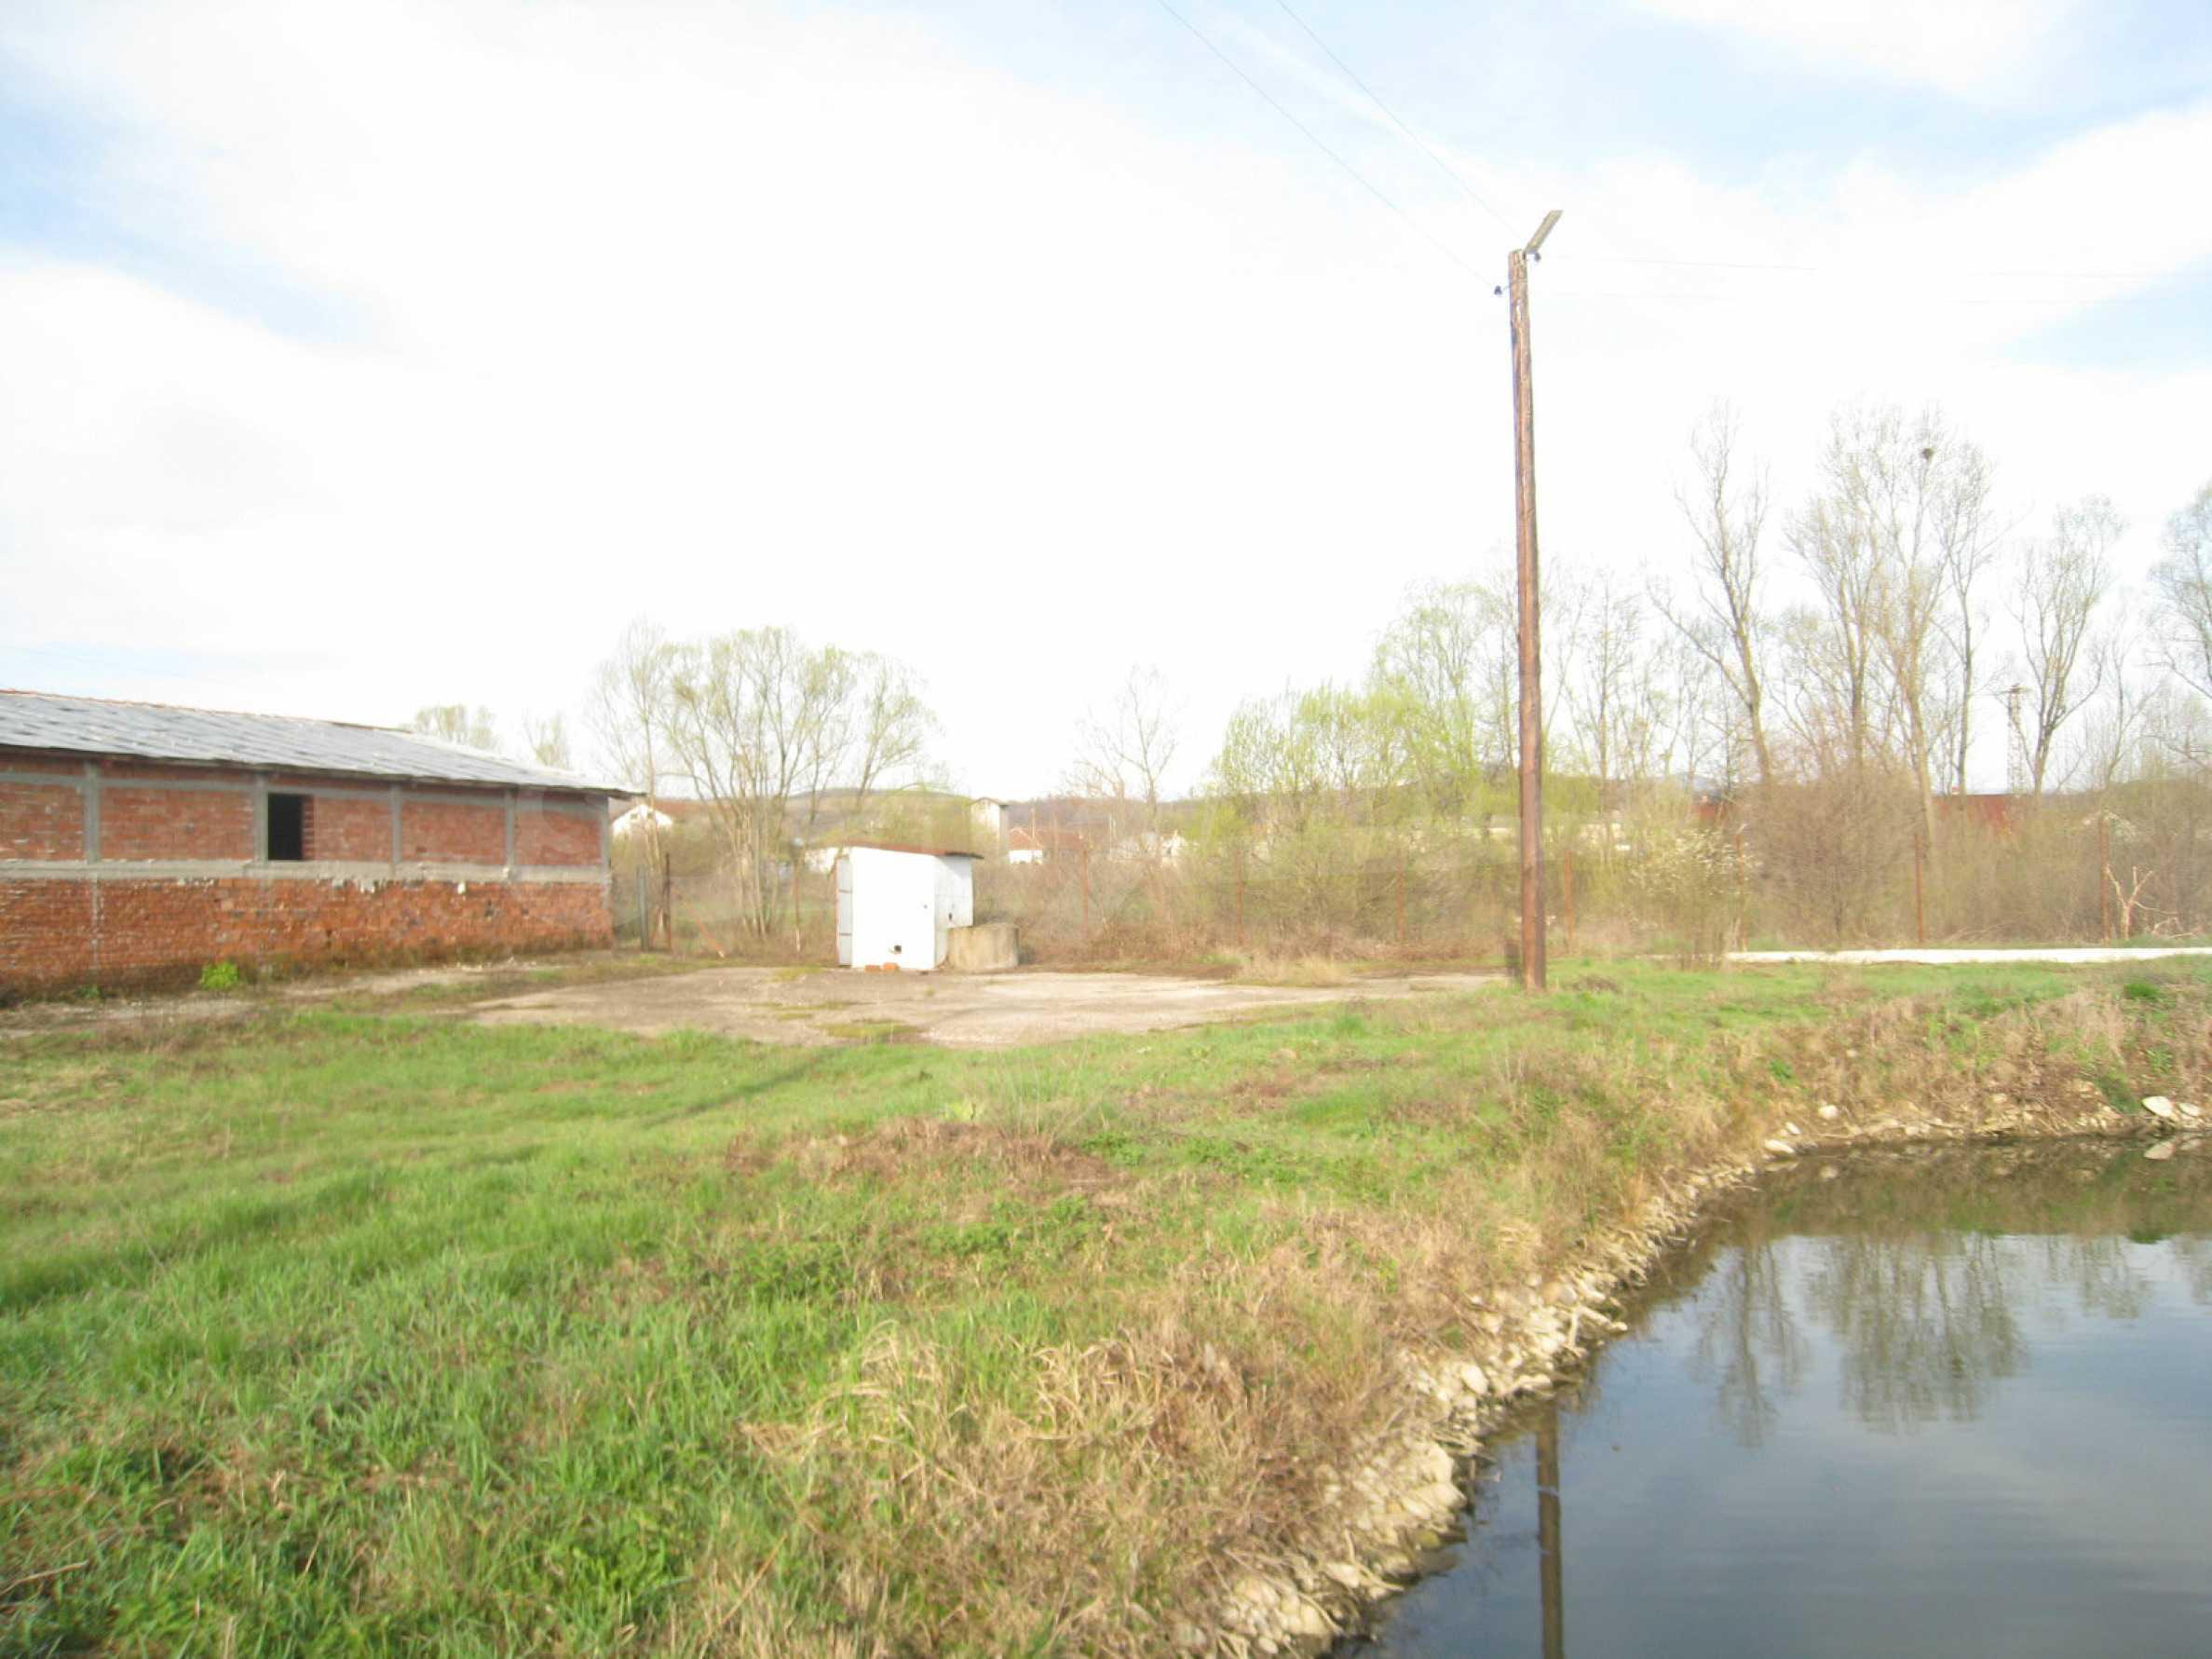 Fishpond, warehouses, residential areas and asphalt ground near Montana 25